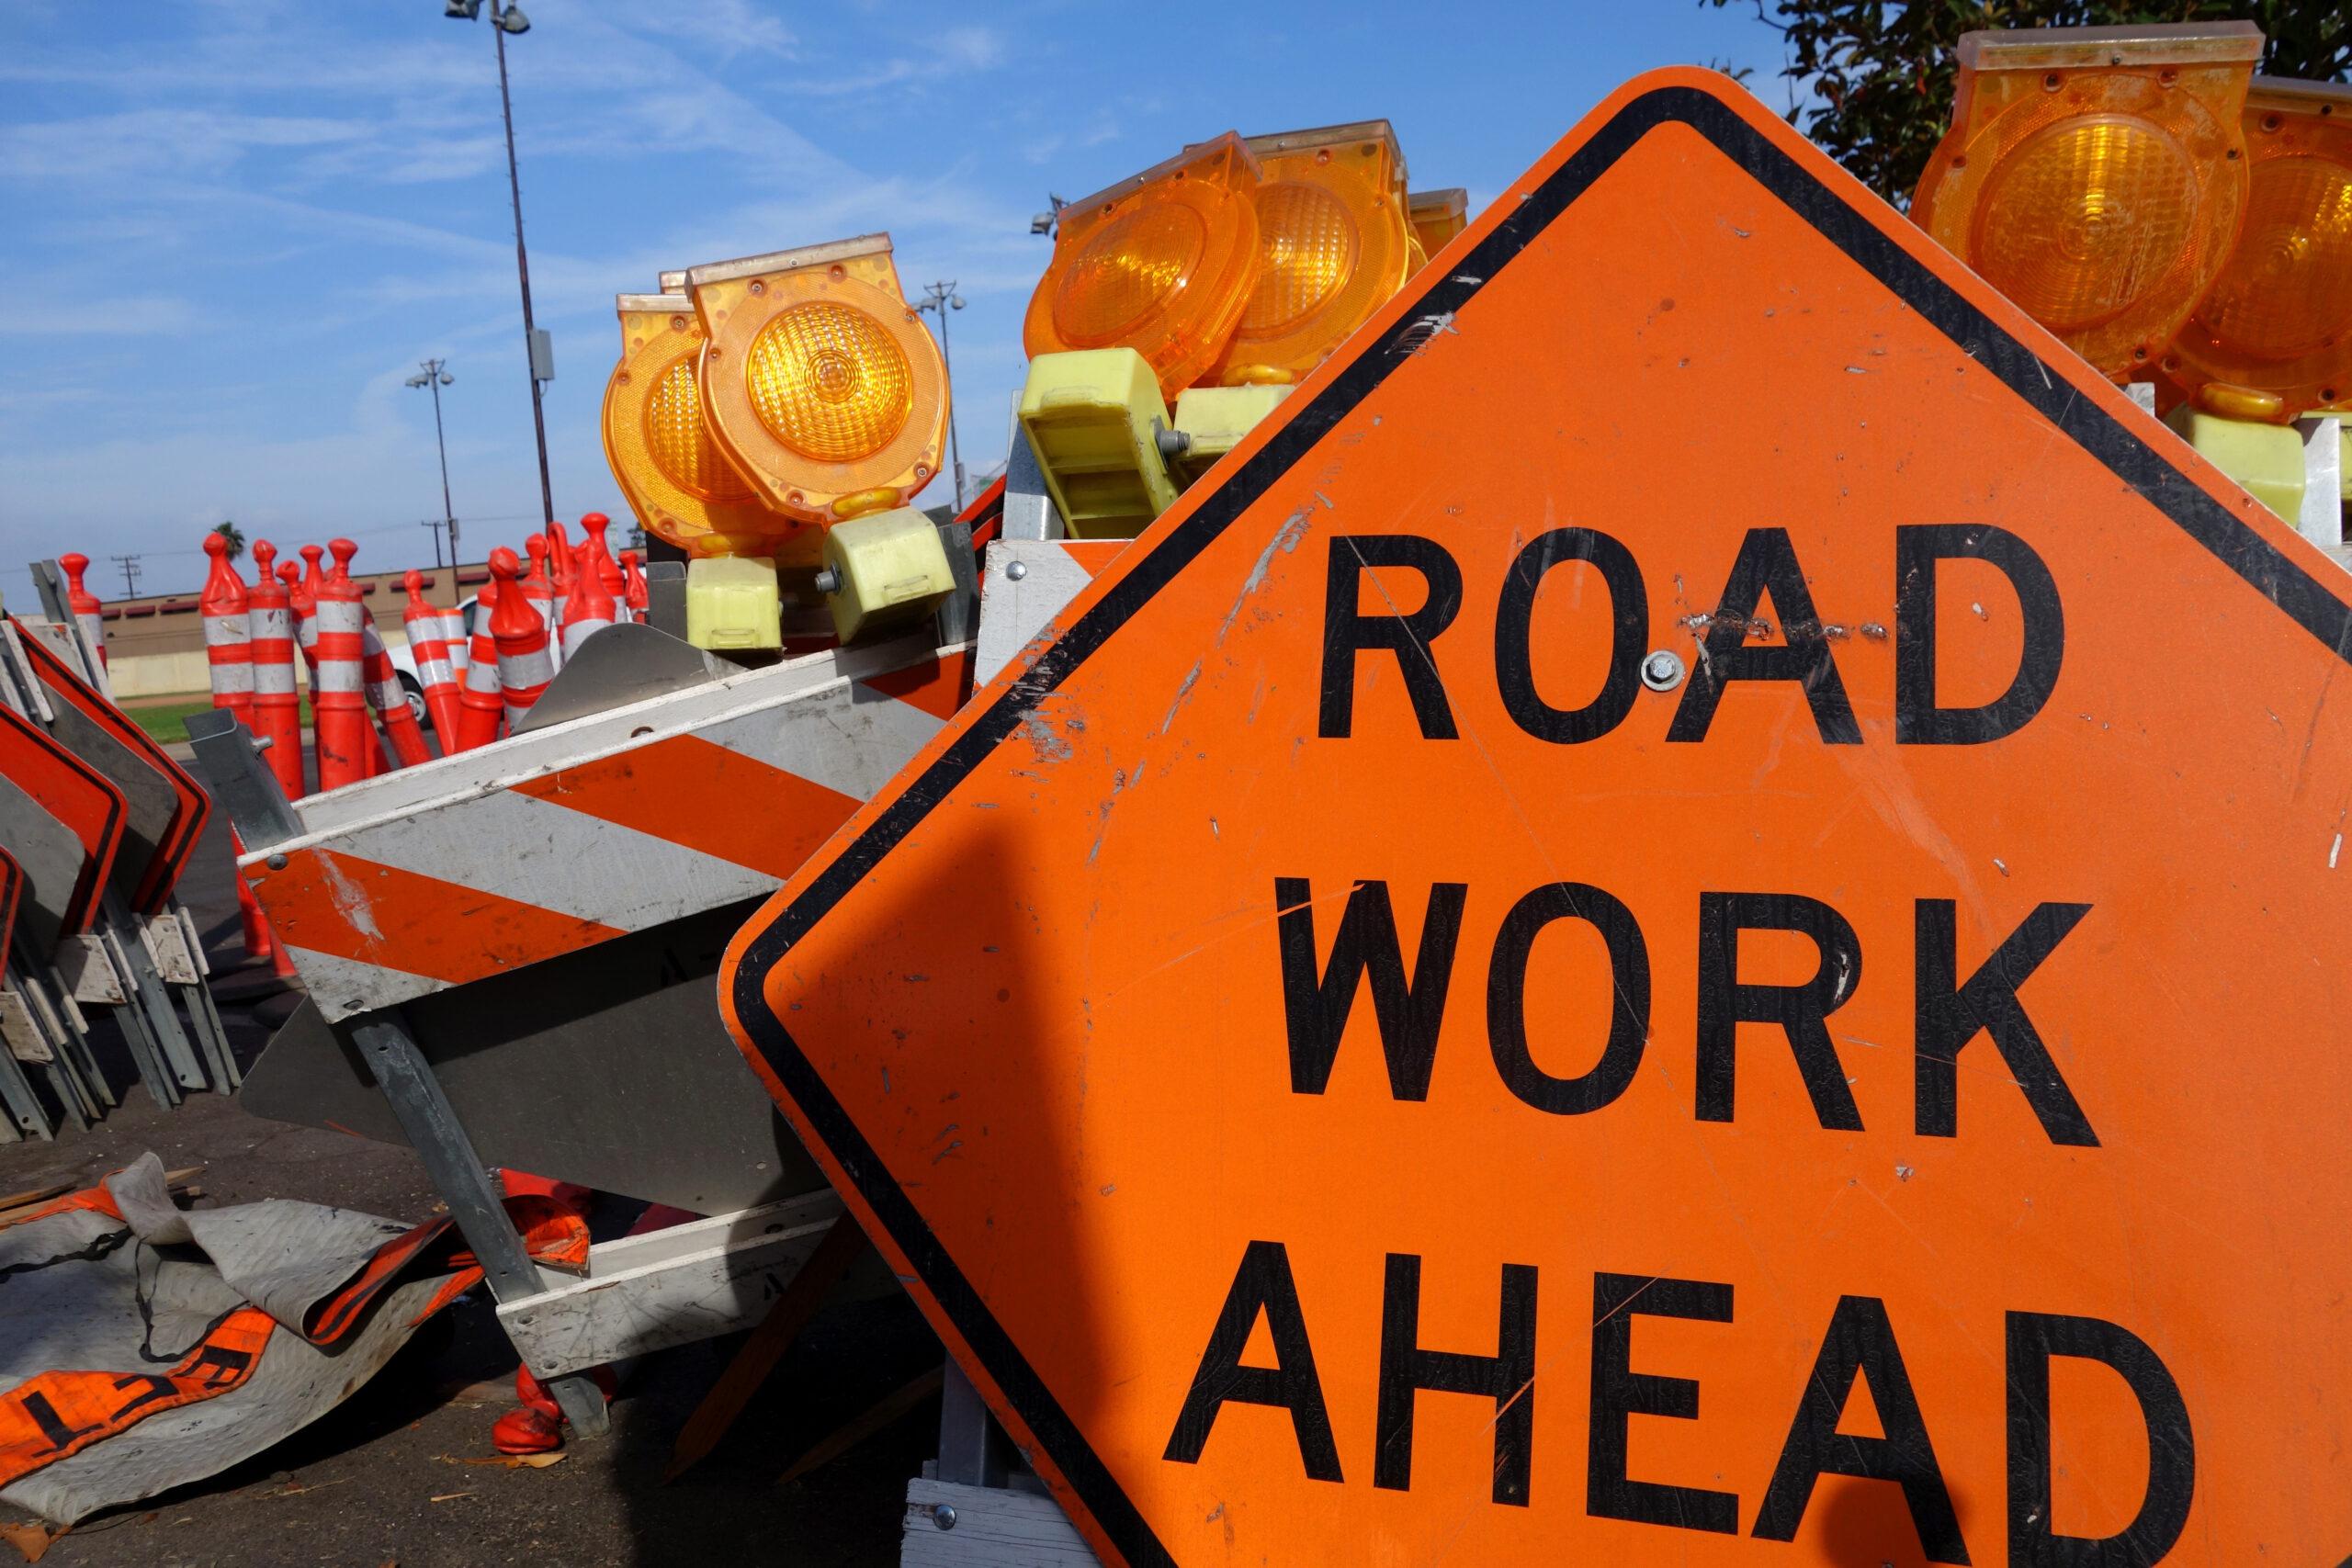 road closed, auburn, traffic alert, traffic sign on road, road work in auburn, traffic auburn wa